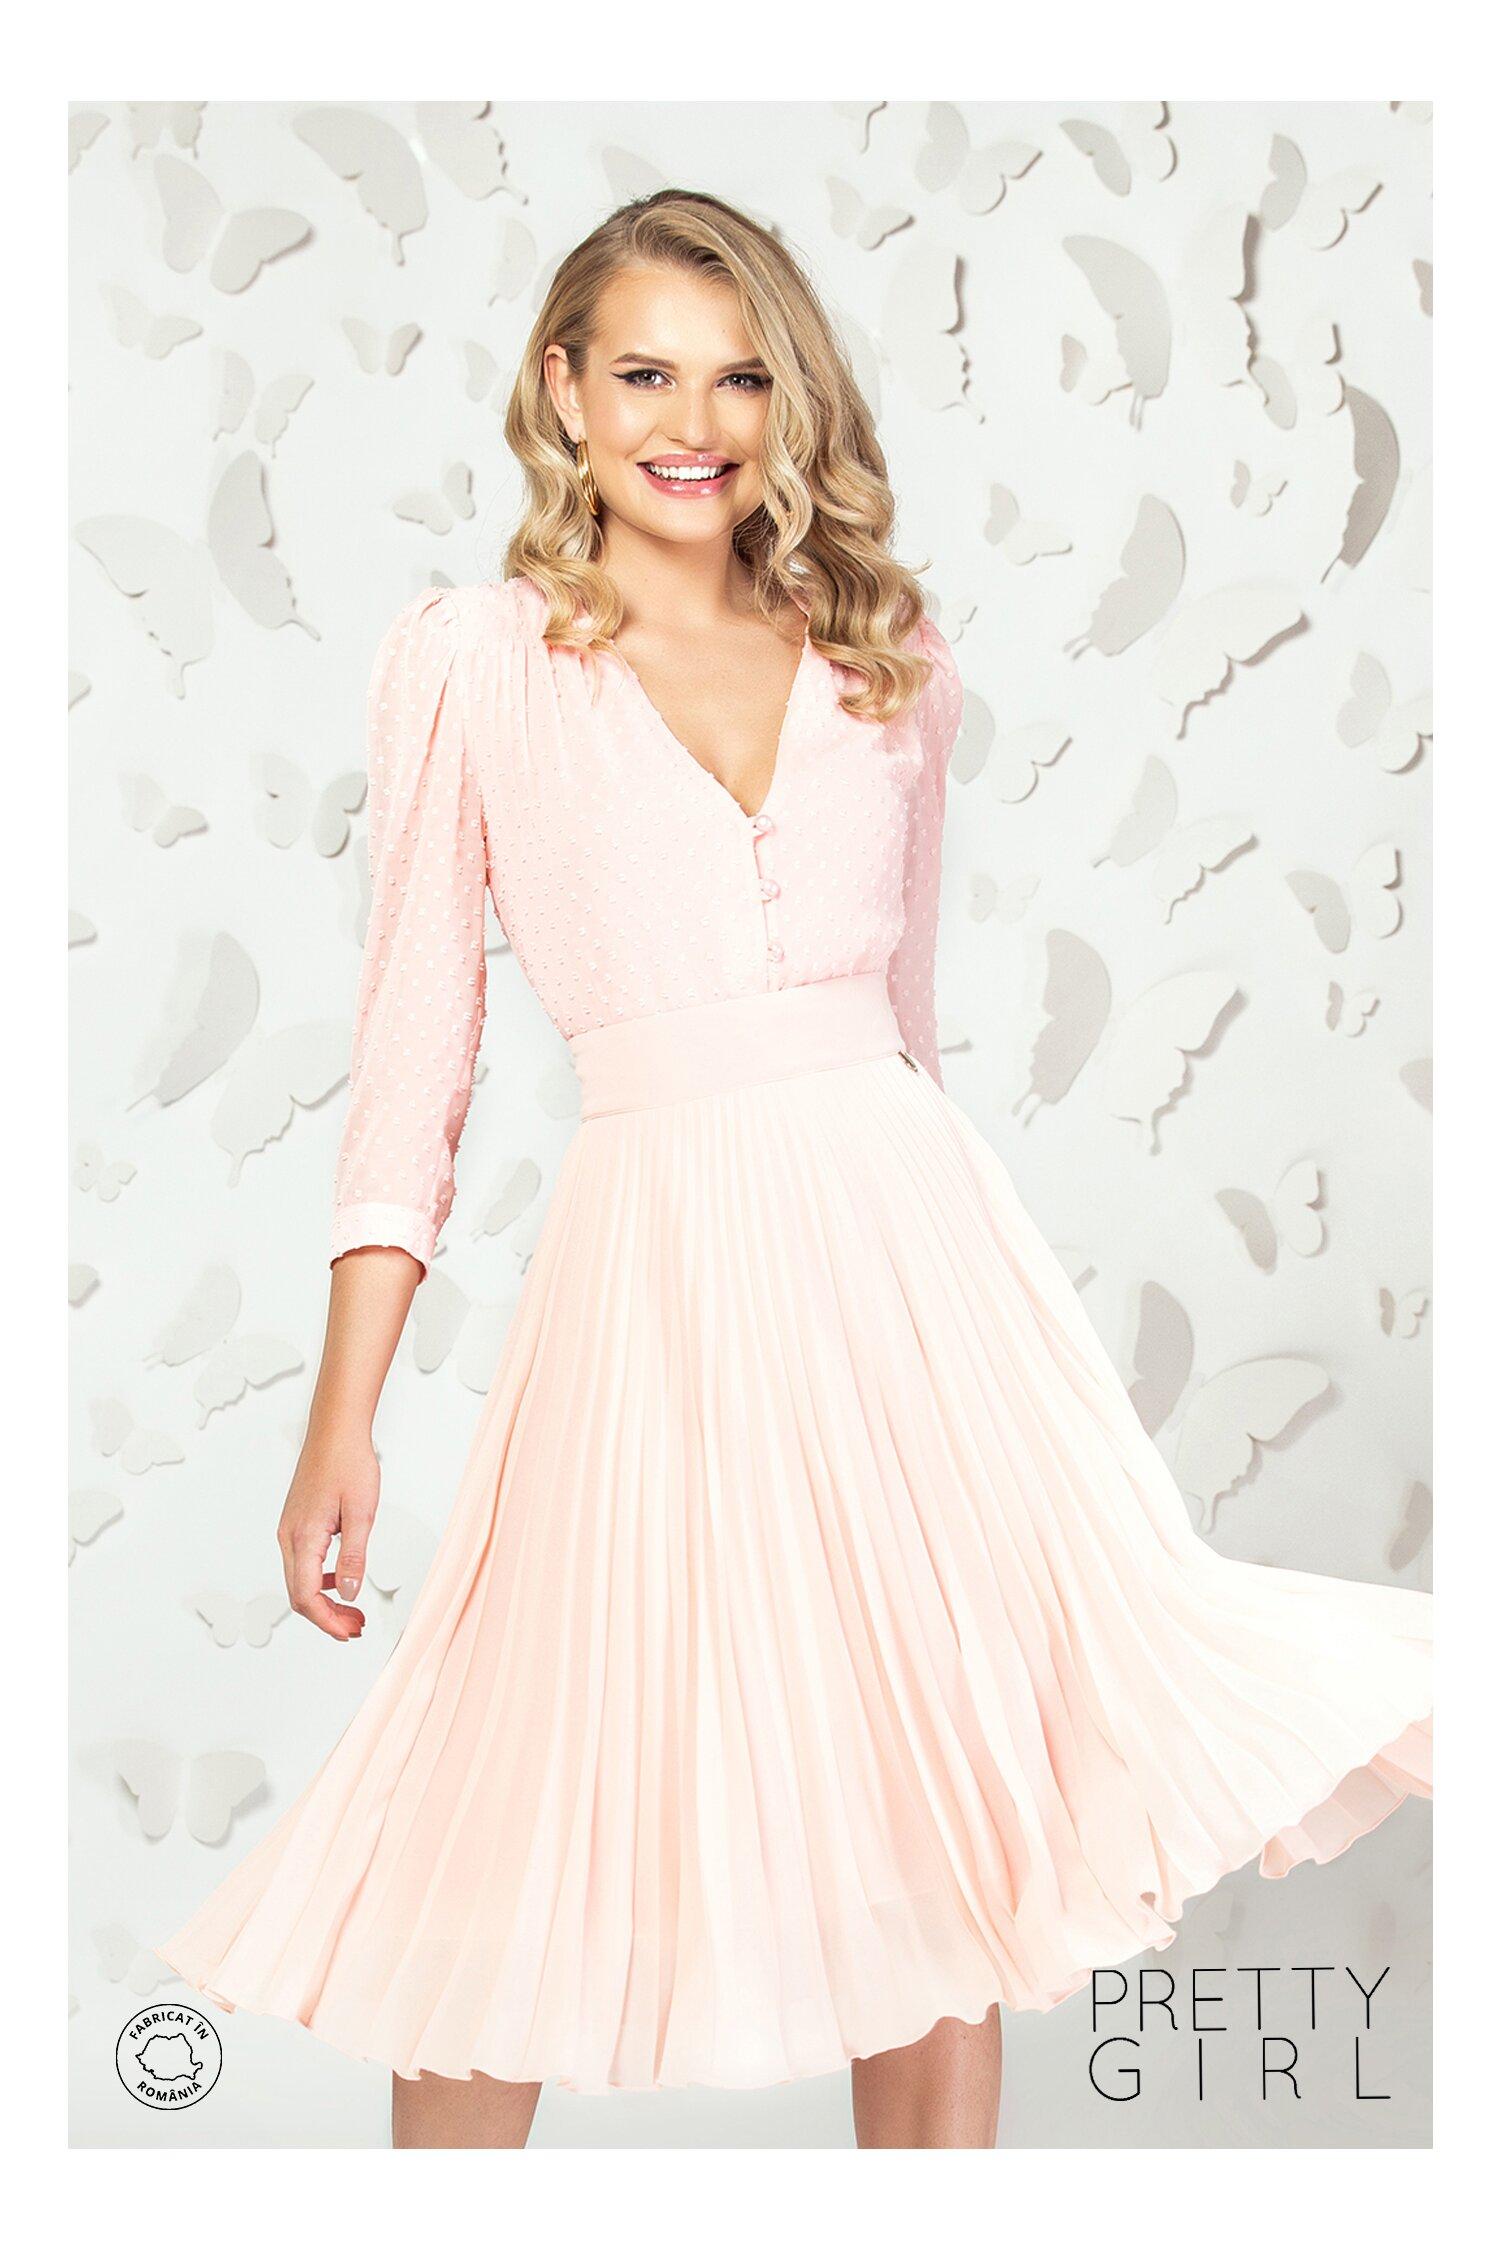 Bluza Pretty Girl roz somon din voal cu aplicatii tip plumeti